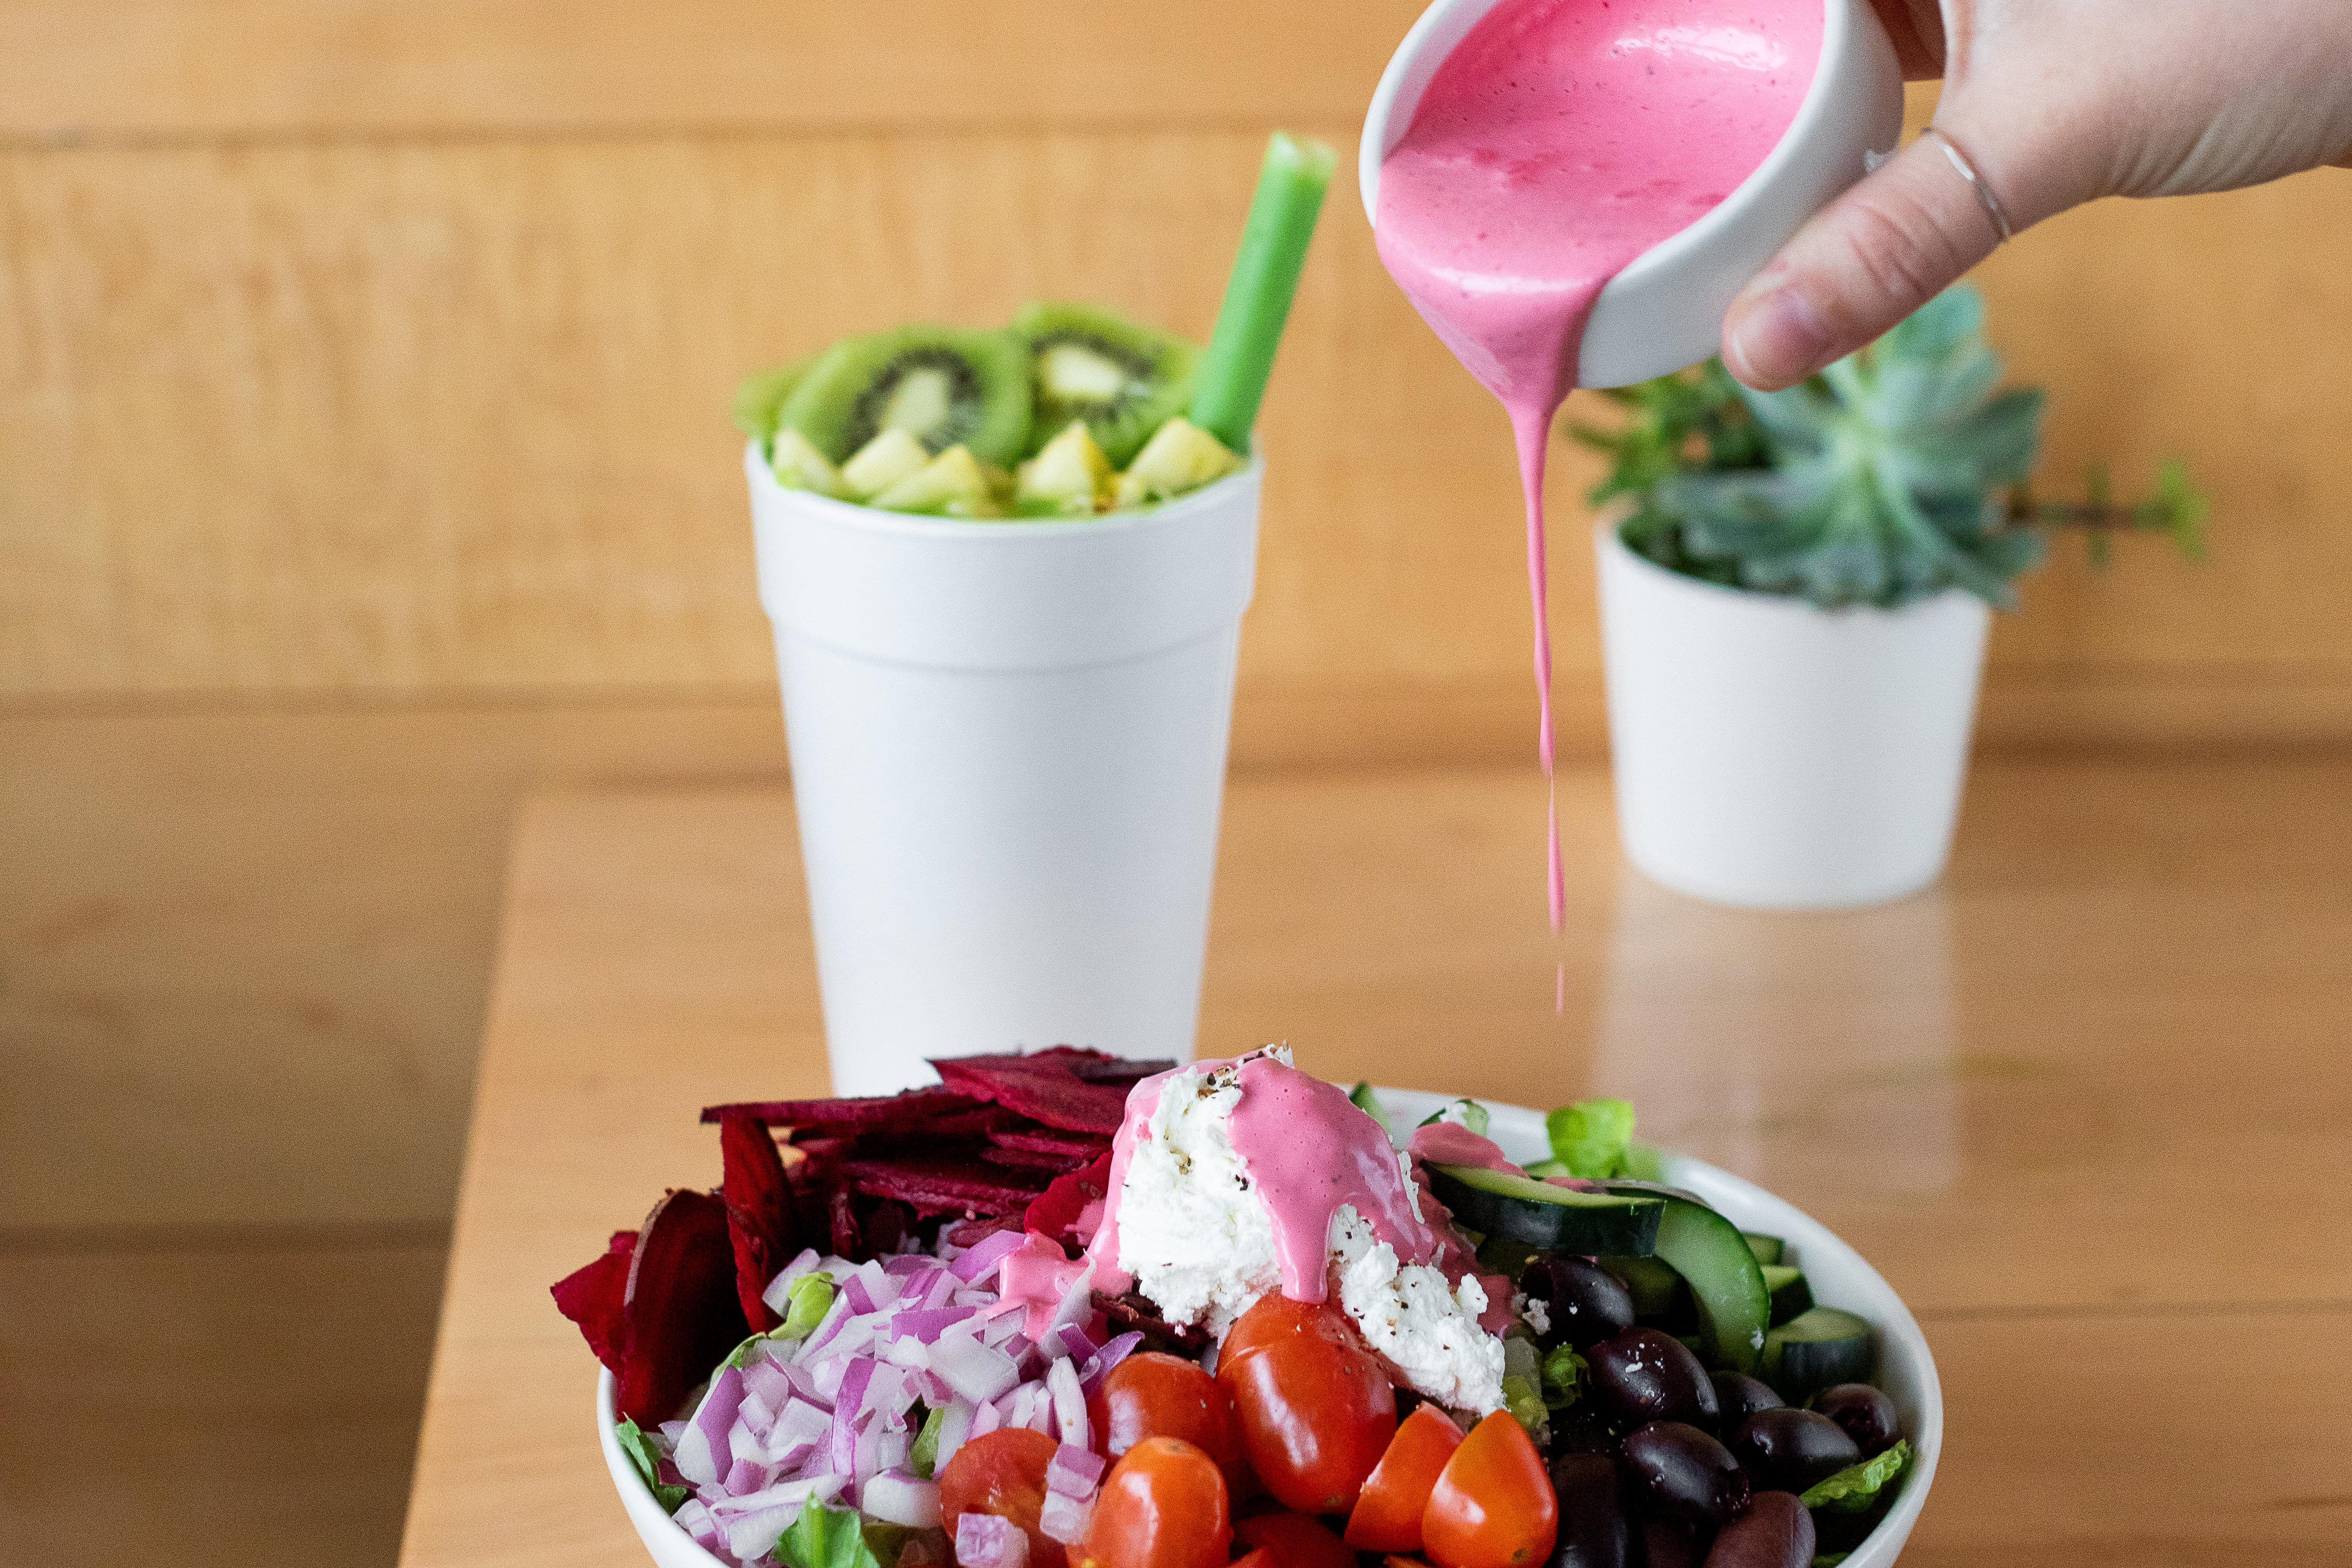 Saucy New Salad Restaurant Sweeps Into the Loop